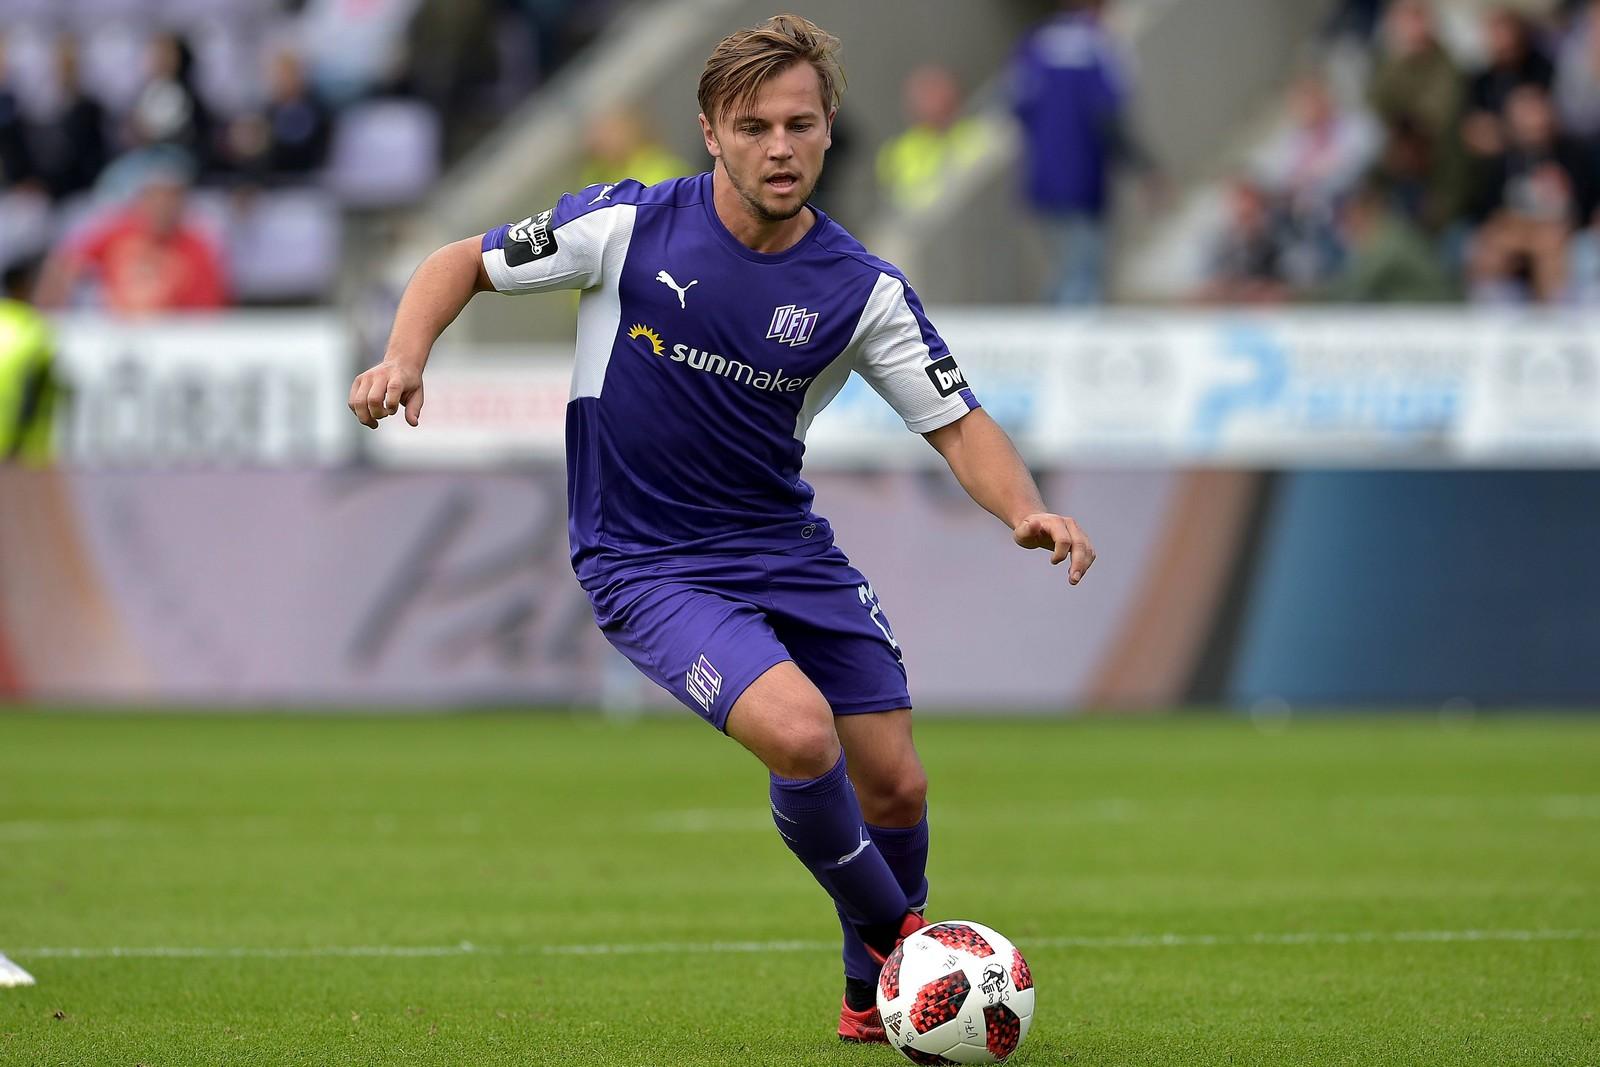 David Blacha vom VfL Osnabrück